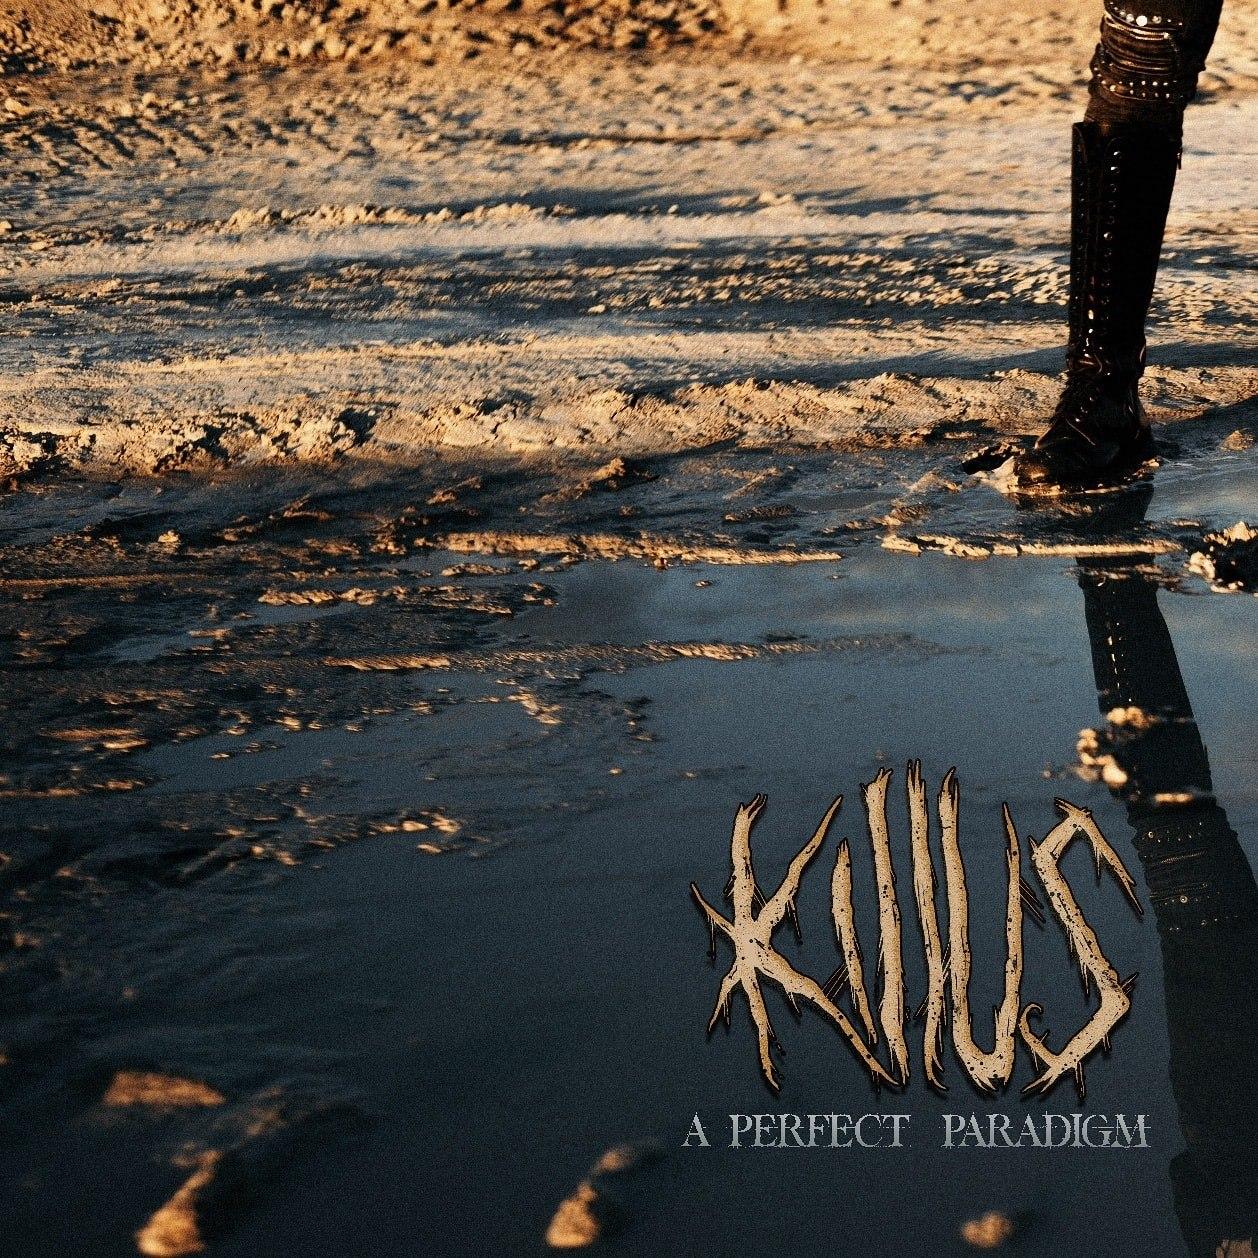 KILLUS presentan su nuevo Audiosingle «A Perfect Paradigm»